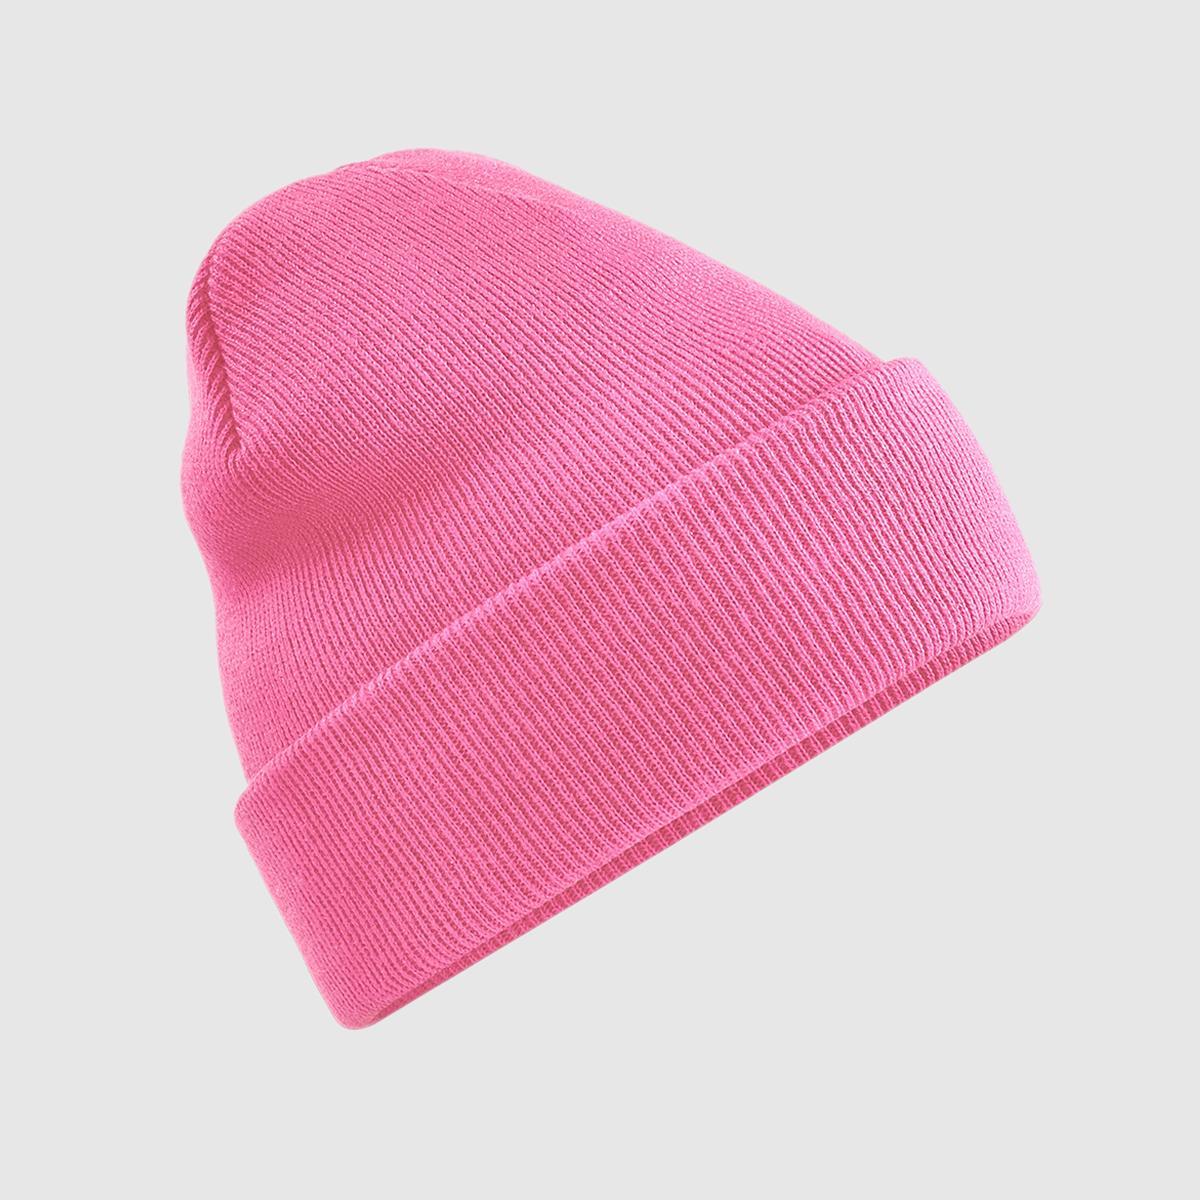 Gorro de punto con borde vuelto color rosa.